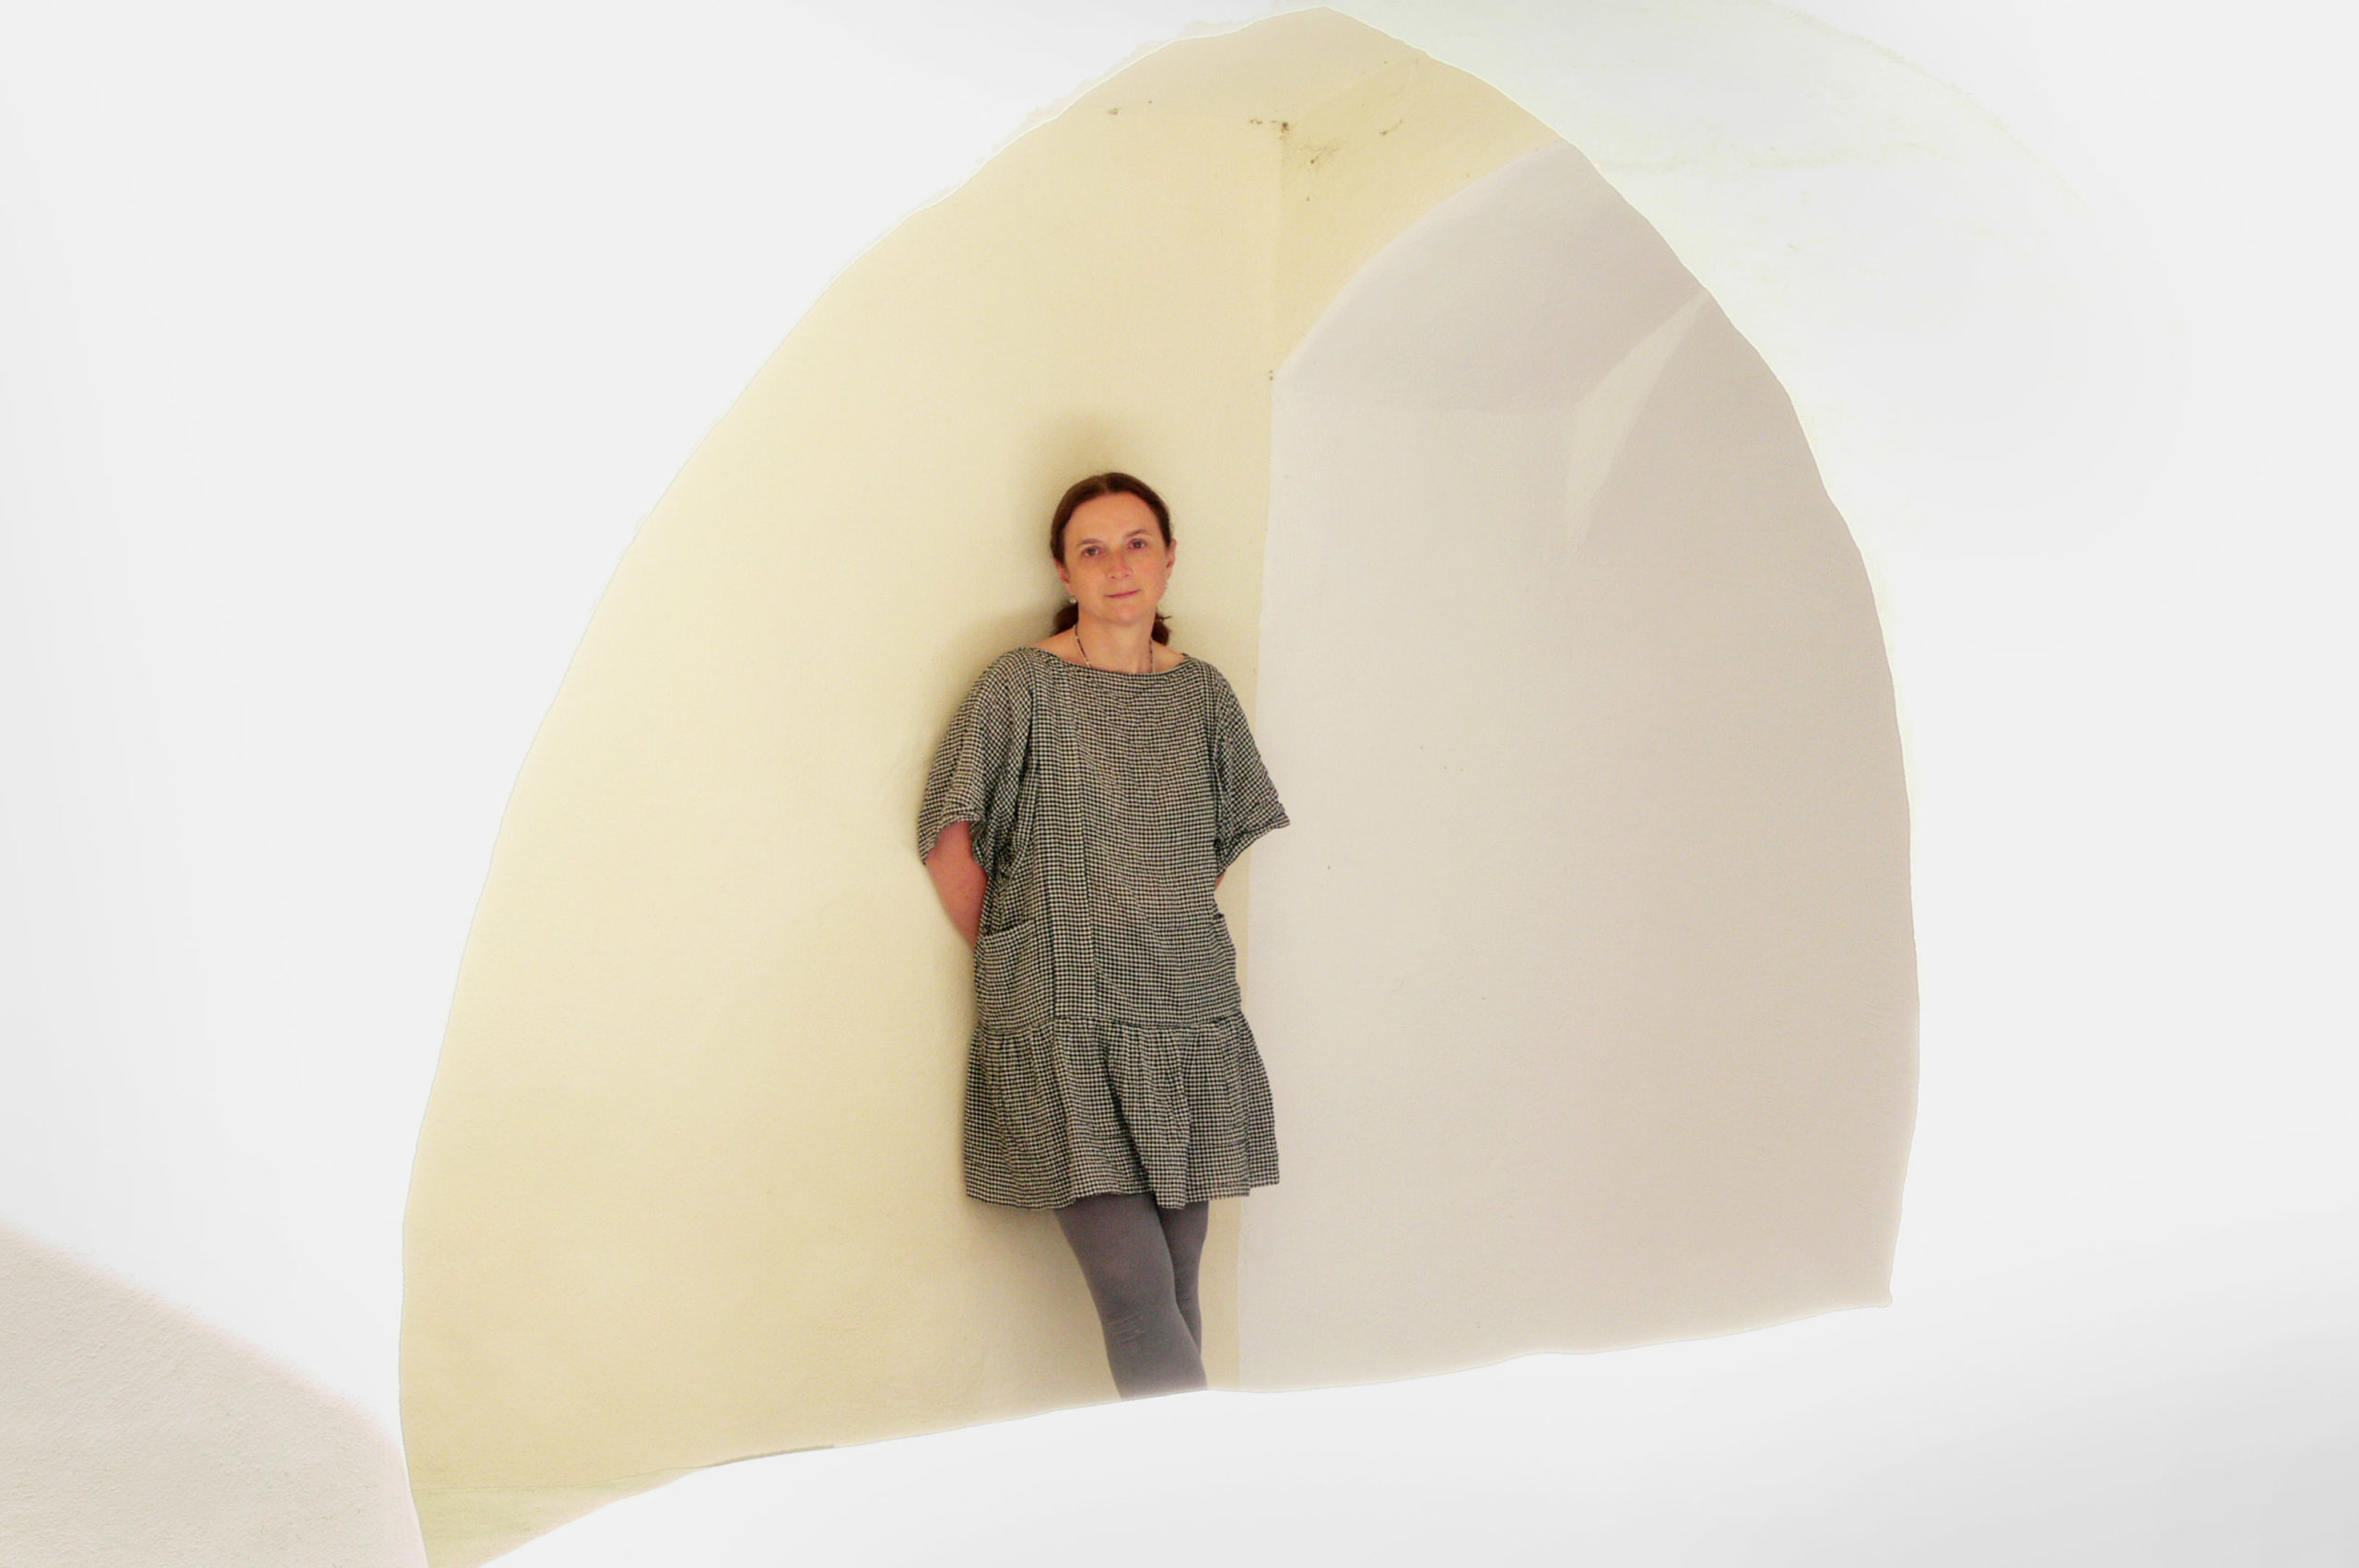 Kikki Ghezzi leans against a wall in a grey dress